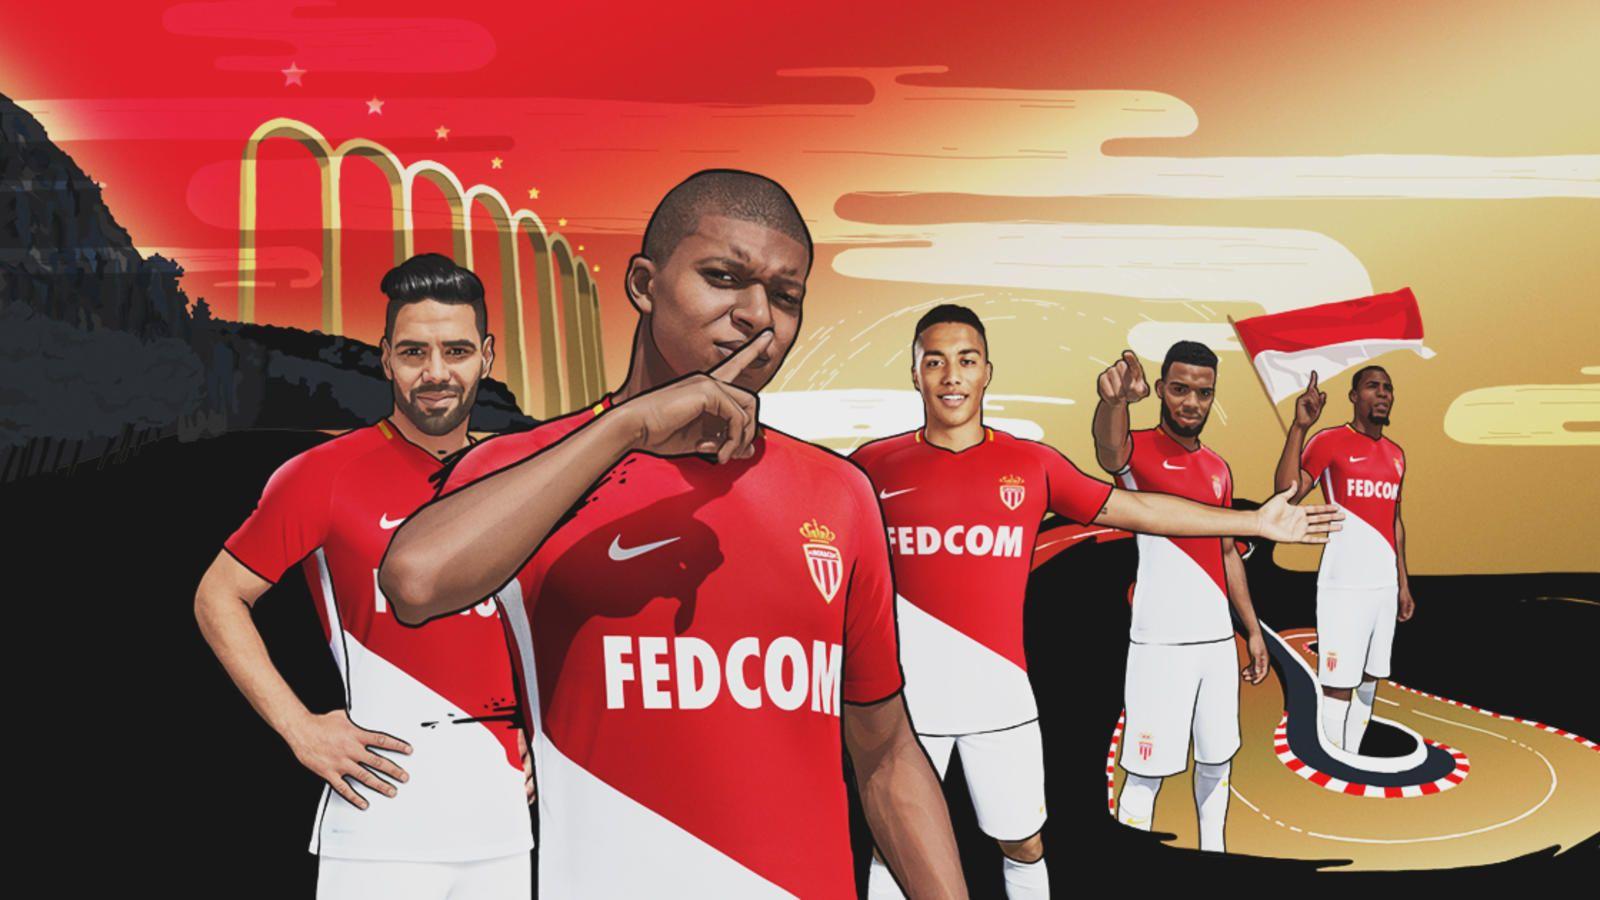 AS Monaco Home Kit 2017-2018 | As monaco, Soccer jersey, Soccer